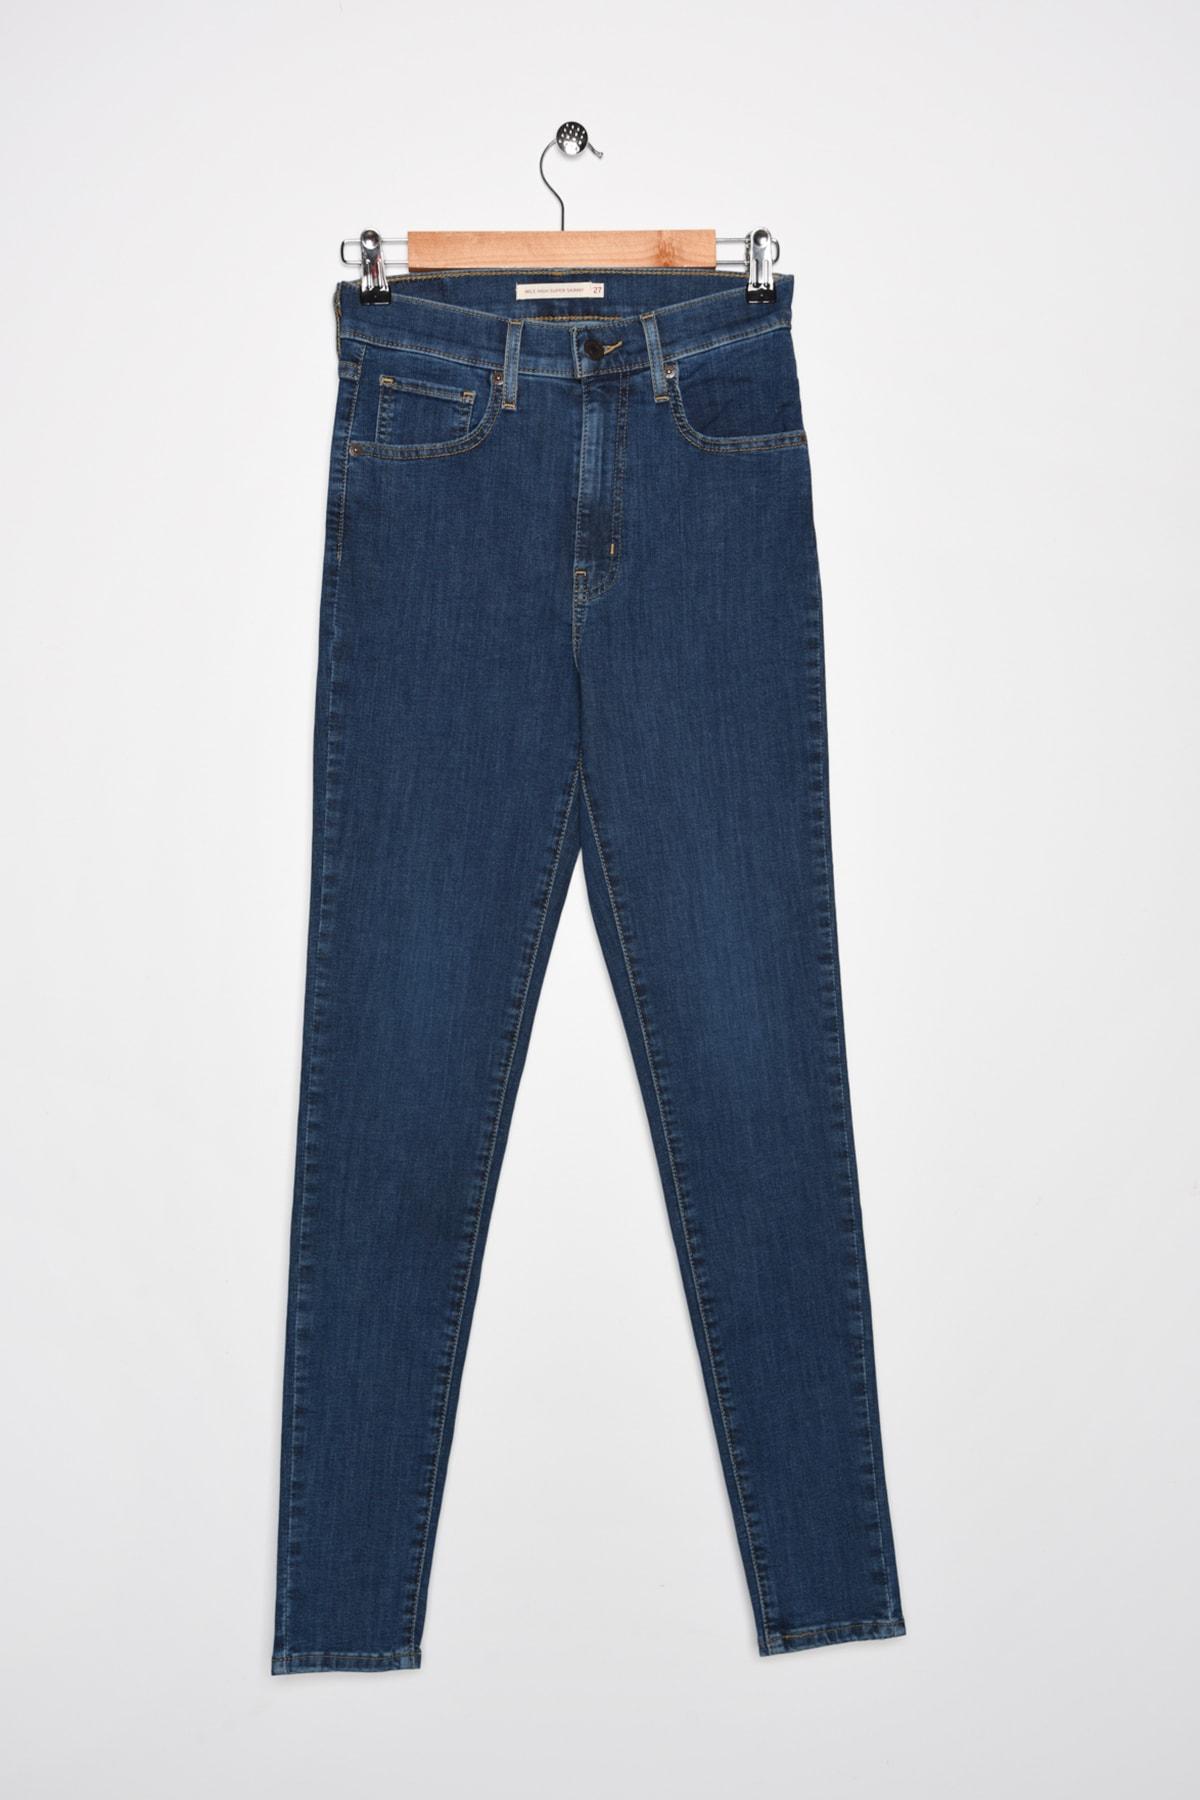 Levi's Kadın High Rise Super Skinny Jeans 22791-0164 1